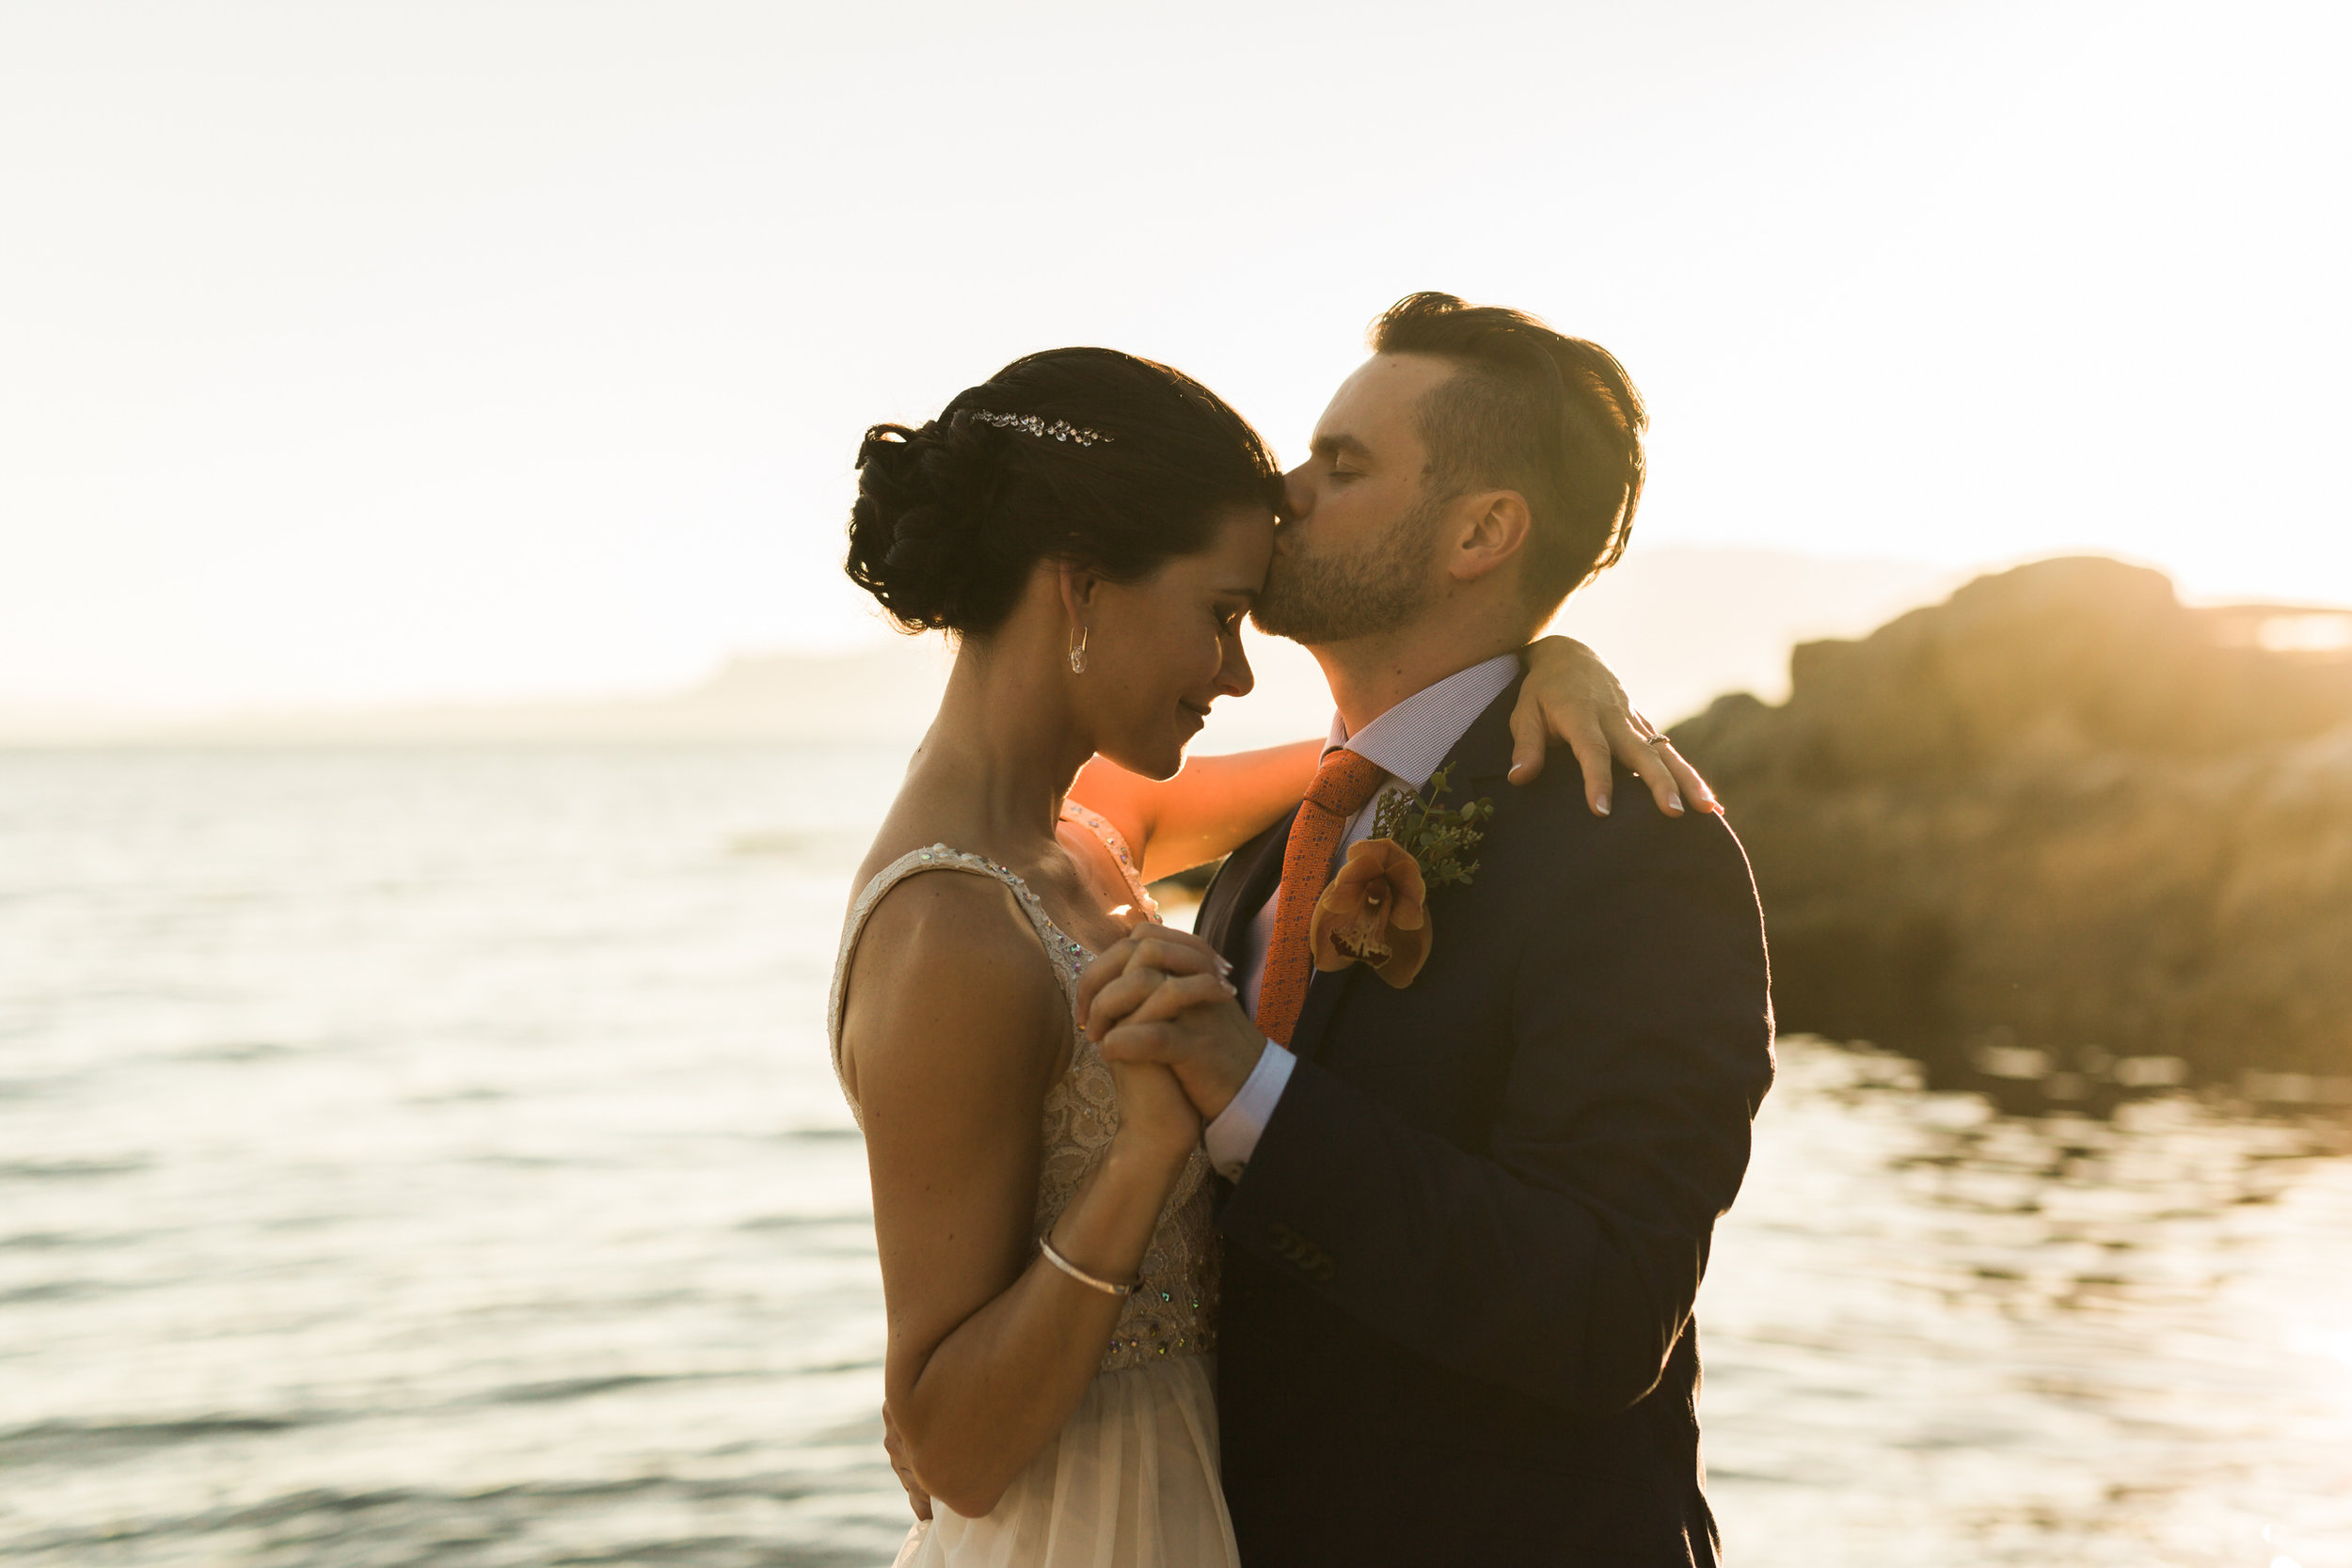 Rockwater Secret Cove Resort Wedding - Sunshine Coast BC Wedding Photographer - Vancouver Wedding Photographer - Sunshine Coast Elopement Photos - IMG_1372.jpg